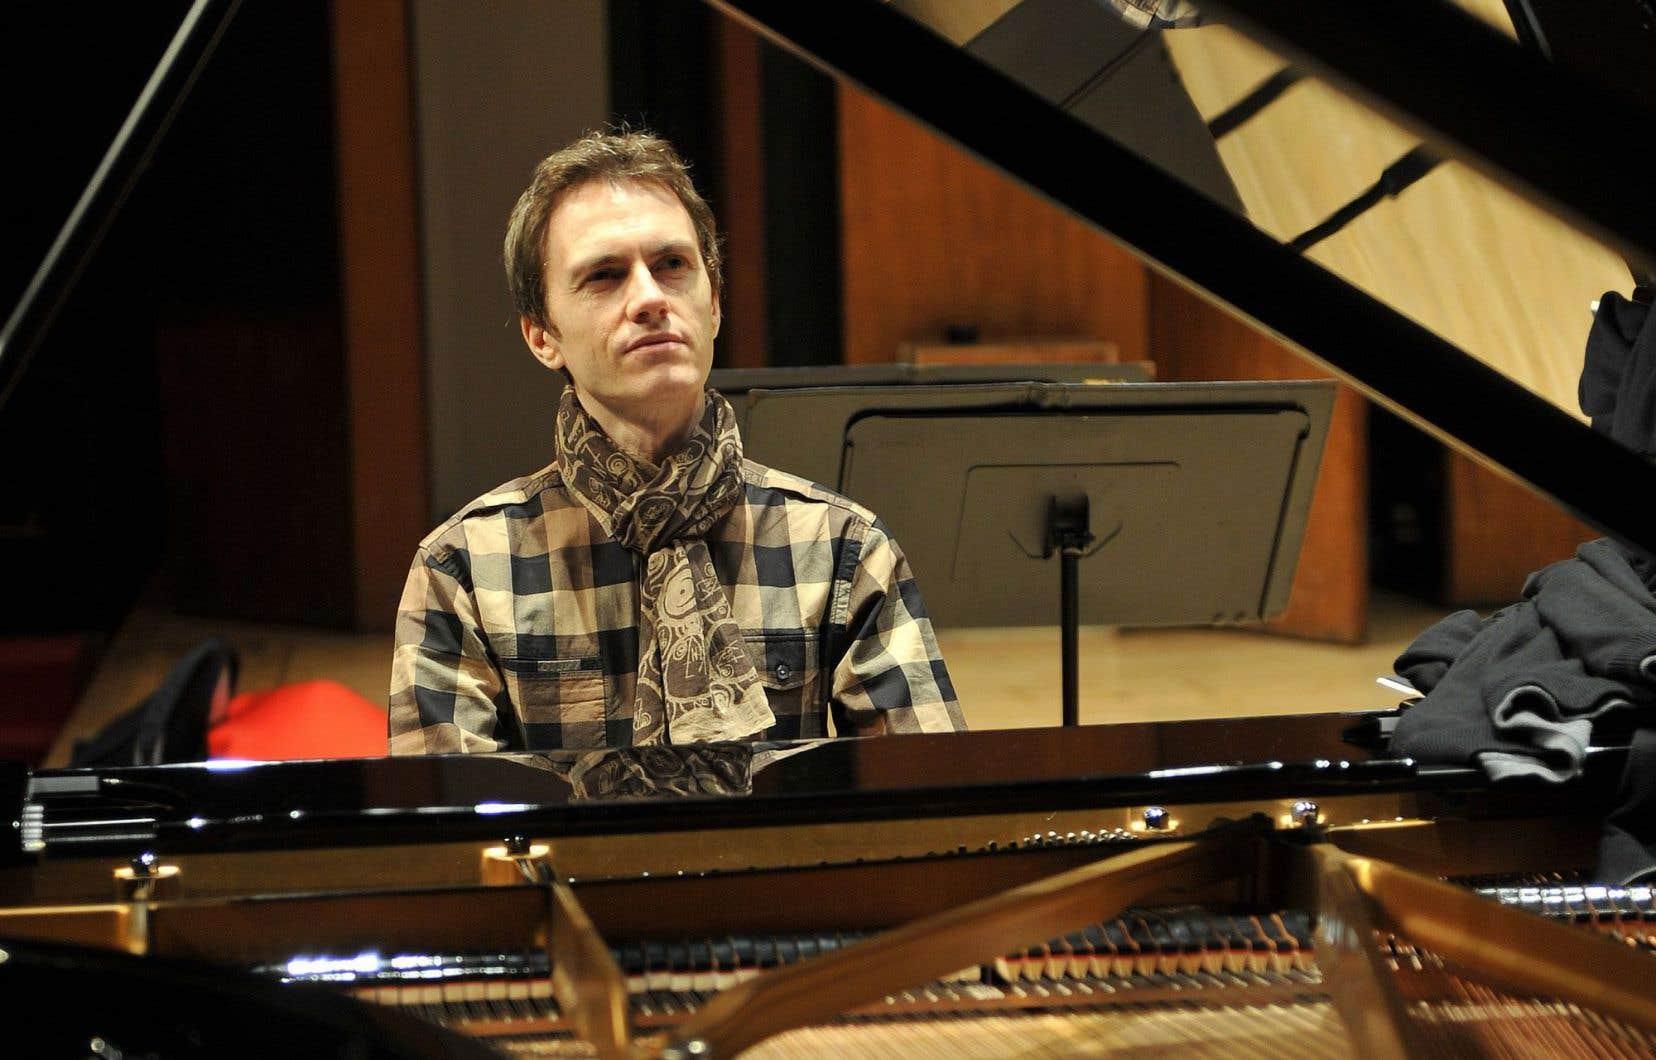 Le pianiste françaisAlexandre Tharaud